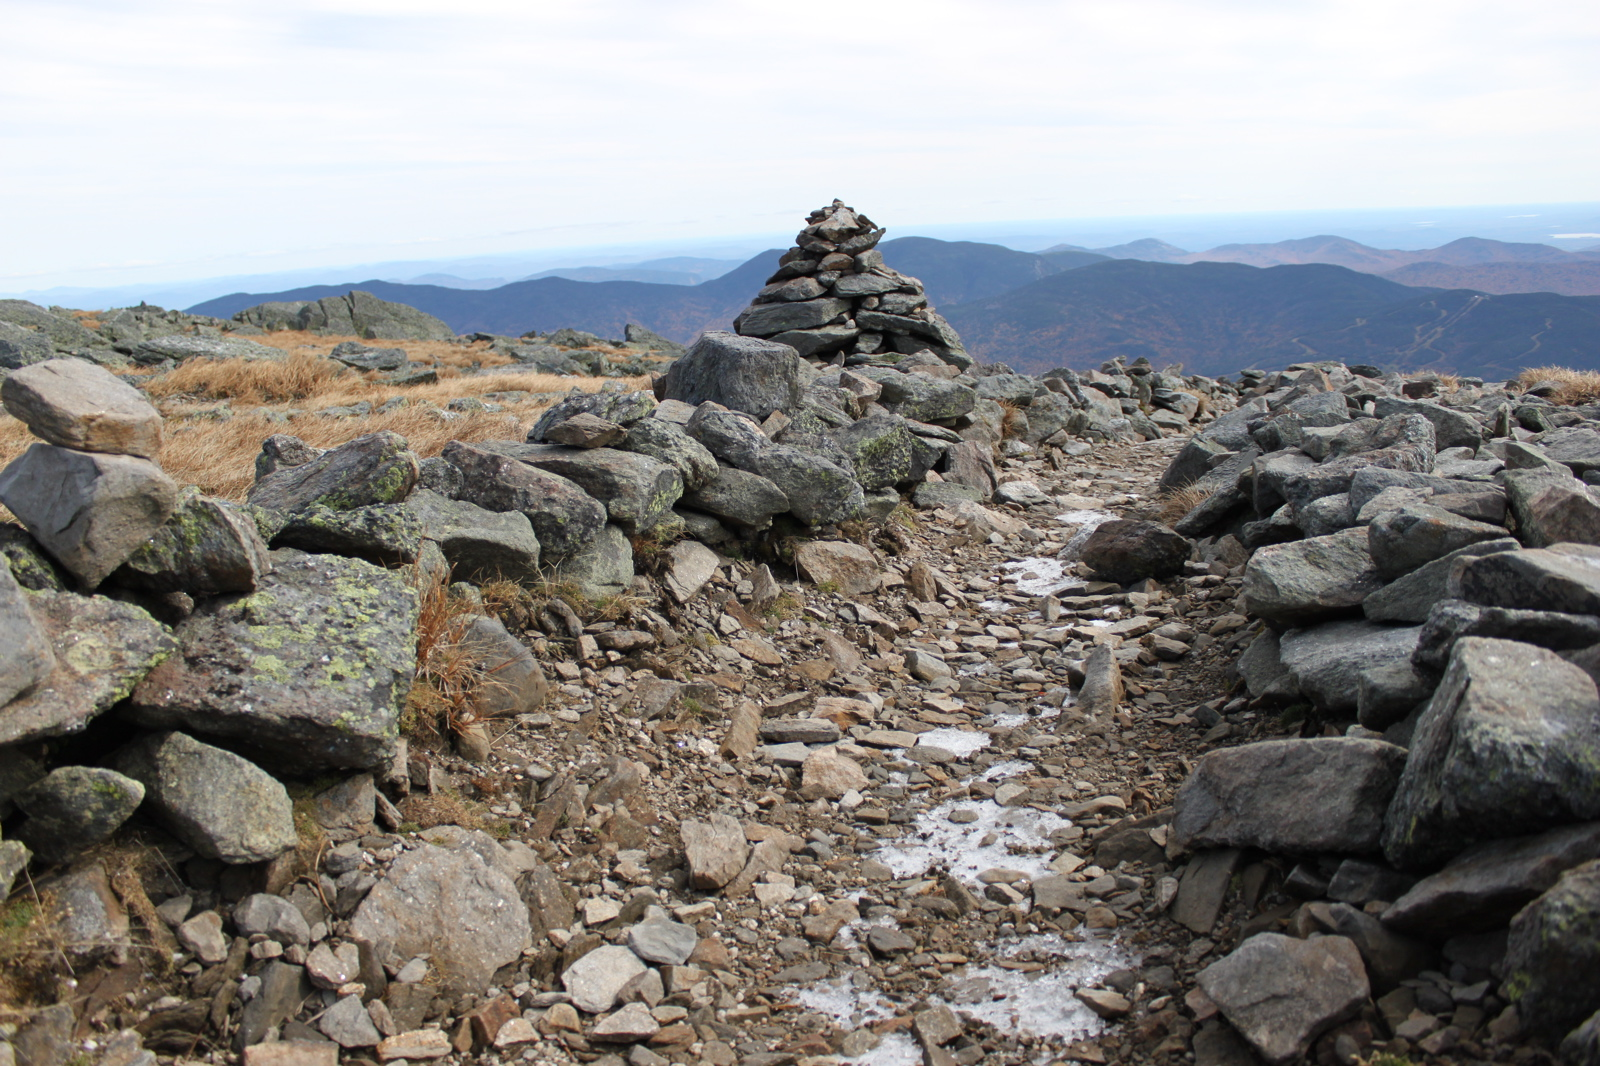 Cairns on the Mount Washington Auto Road - White Mountains, New Hampshire